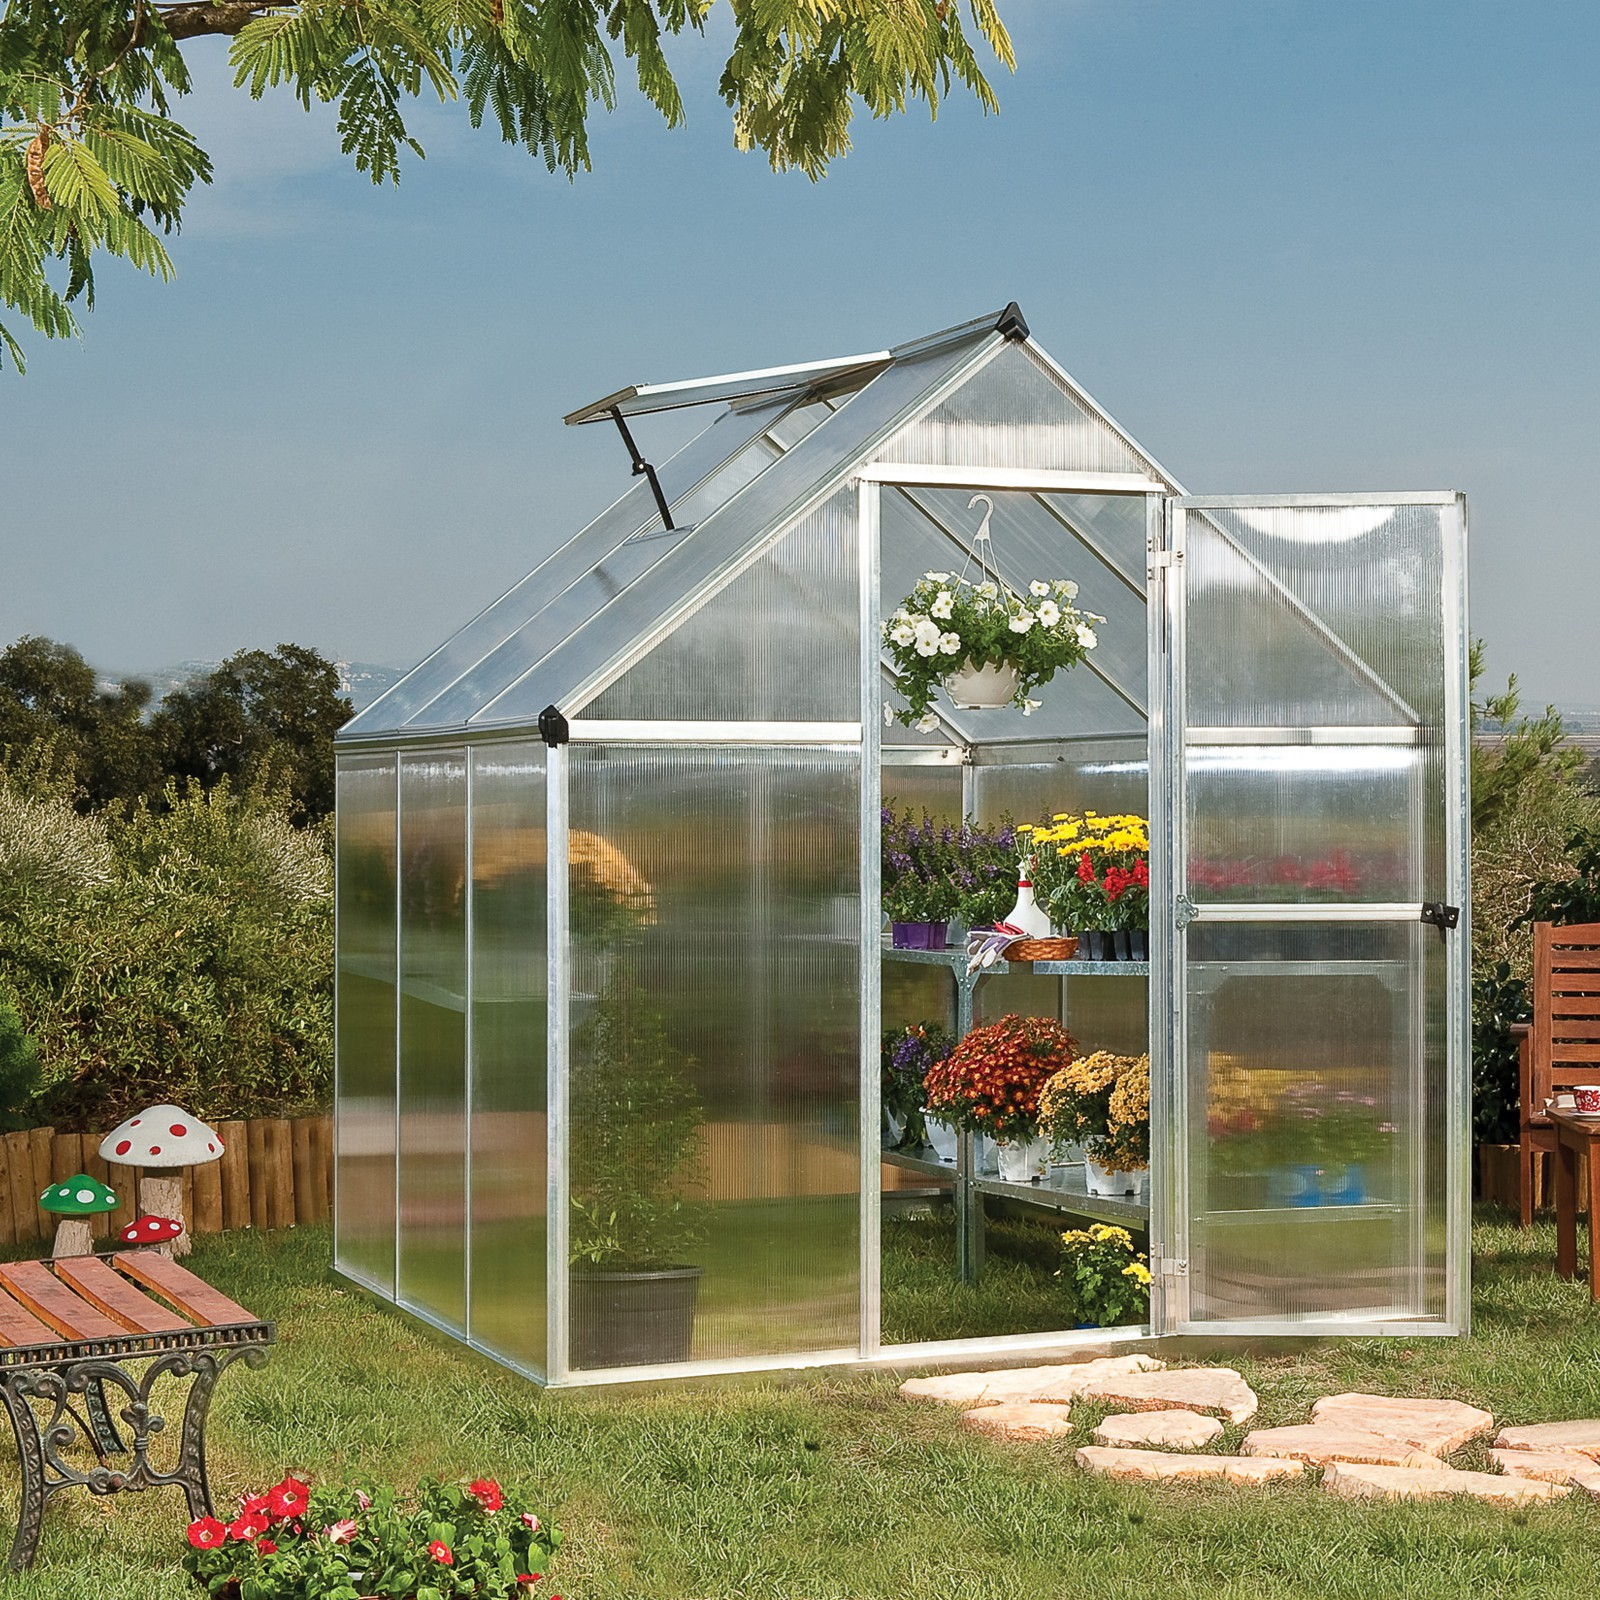 tepro palram gew chshaus 3 4 m treibhaus tomatenhaus 6x6 mythos anzuchthaus ebay. Black Bedroom Furniture Sets. Home Design Ideas